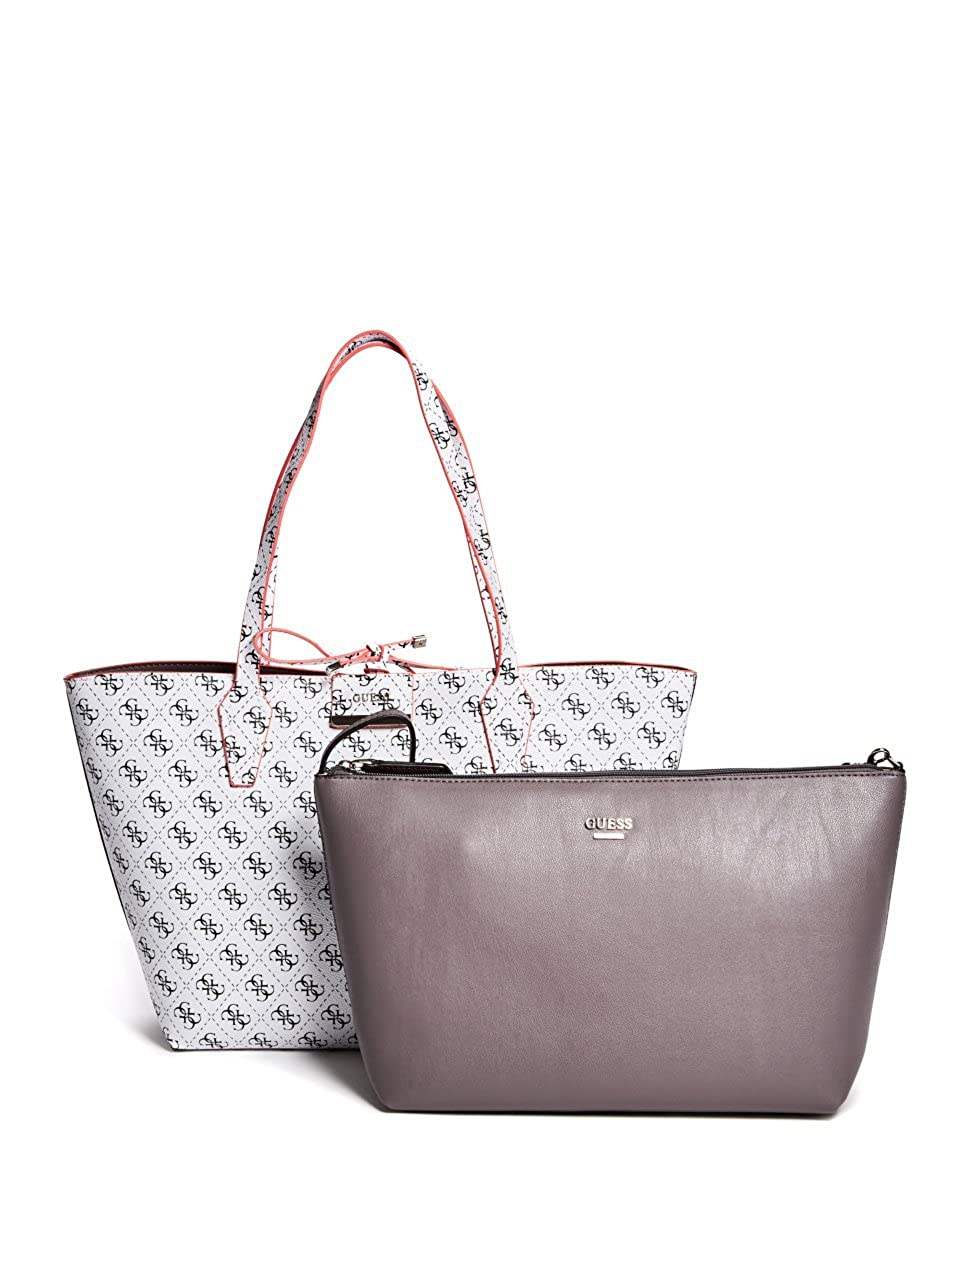 b017591810b Amazon.com: GUESS Bobbi Inside Out Reversible Shopper Travel Tote Bag  Handbag & Removable Pouch 2PC - White: Clothing